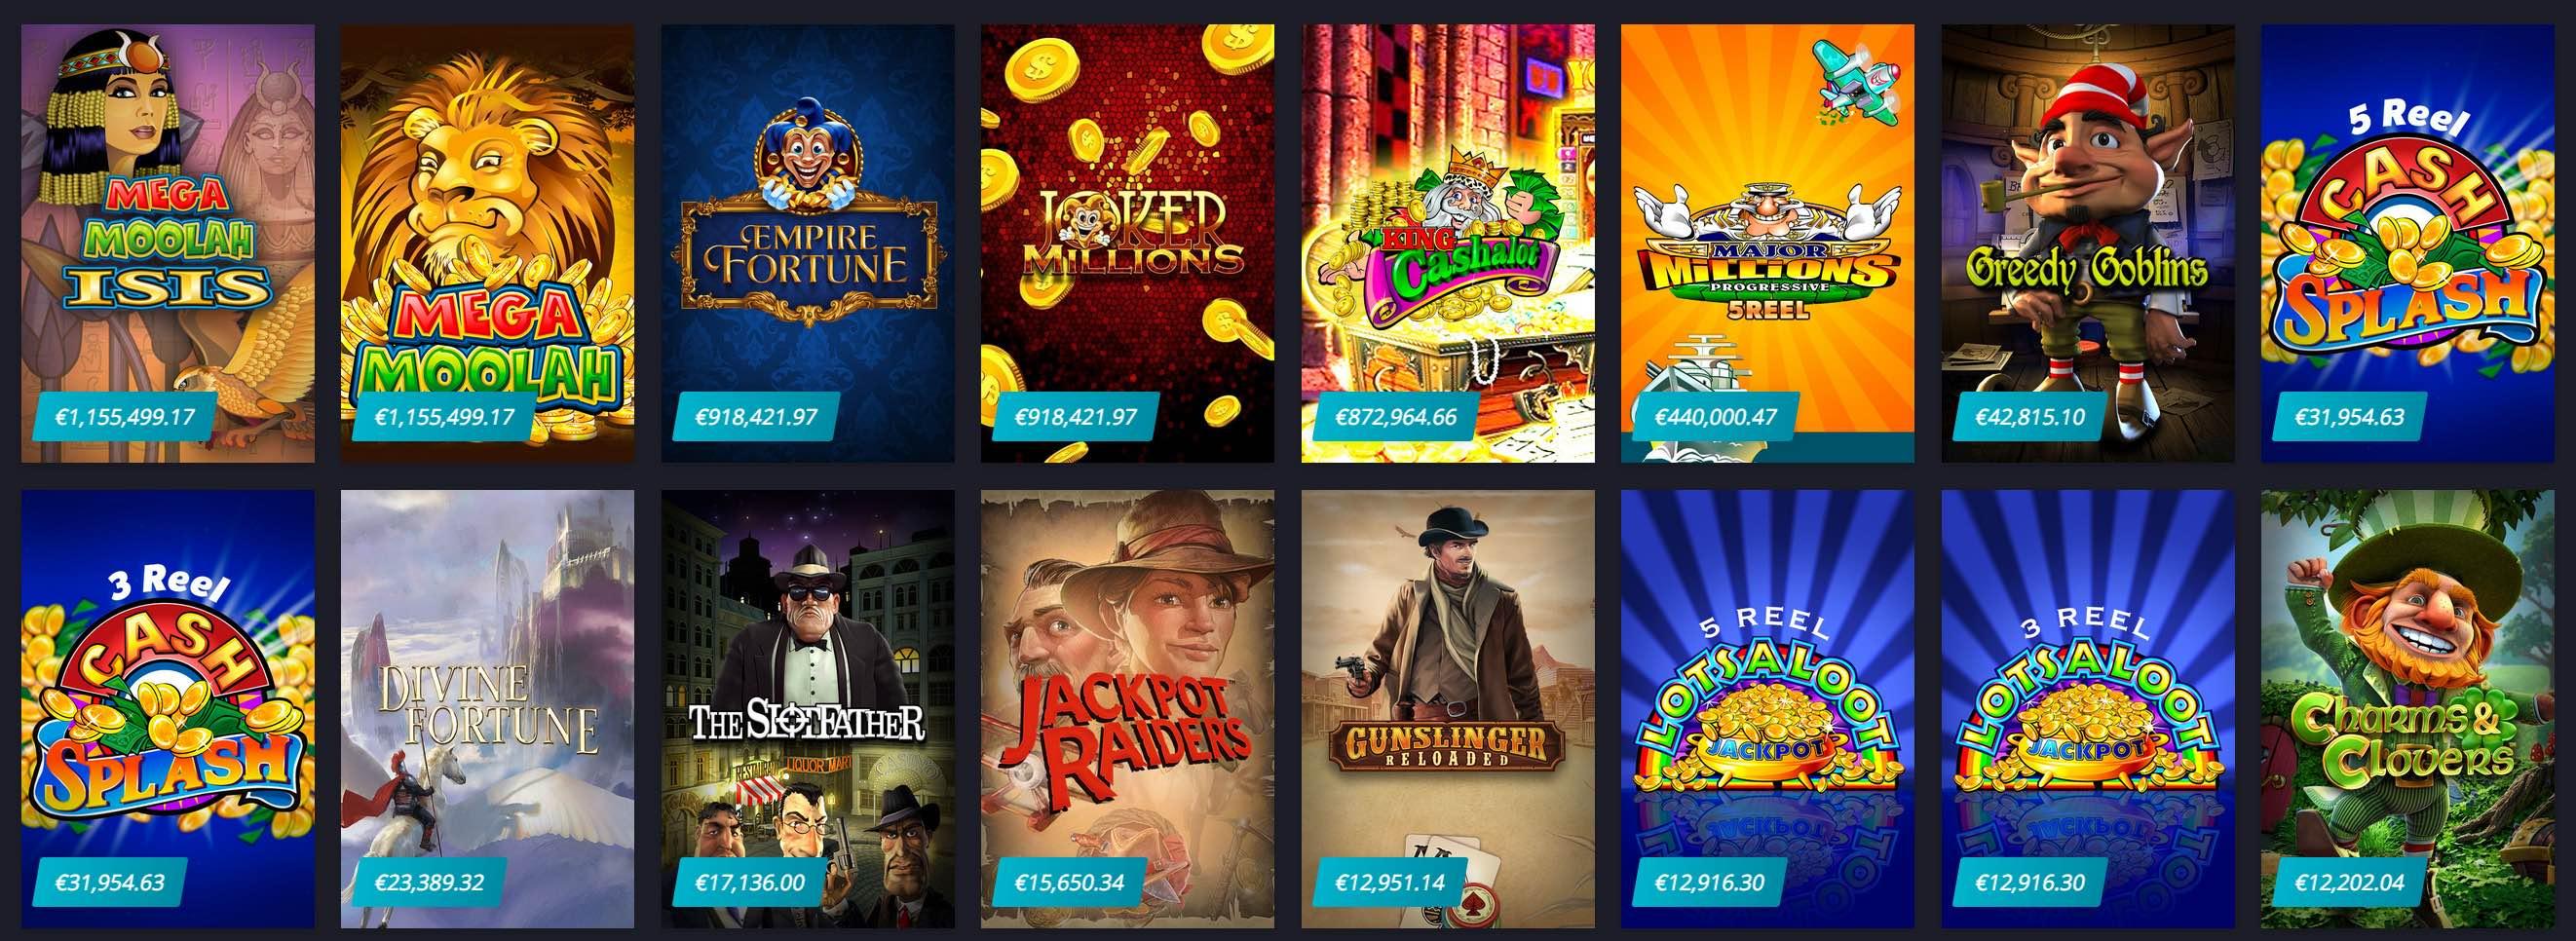 Mega progressive Jackpot Slots und Spiele